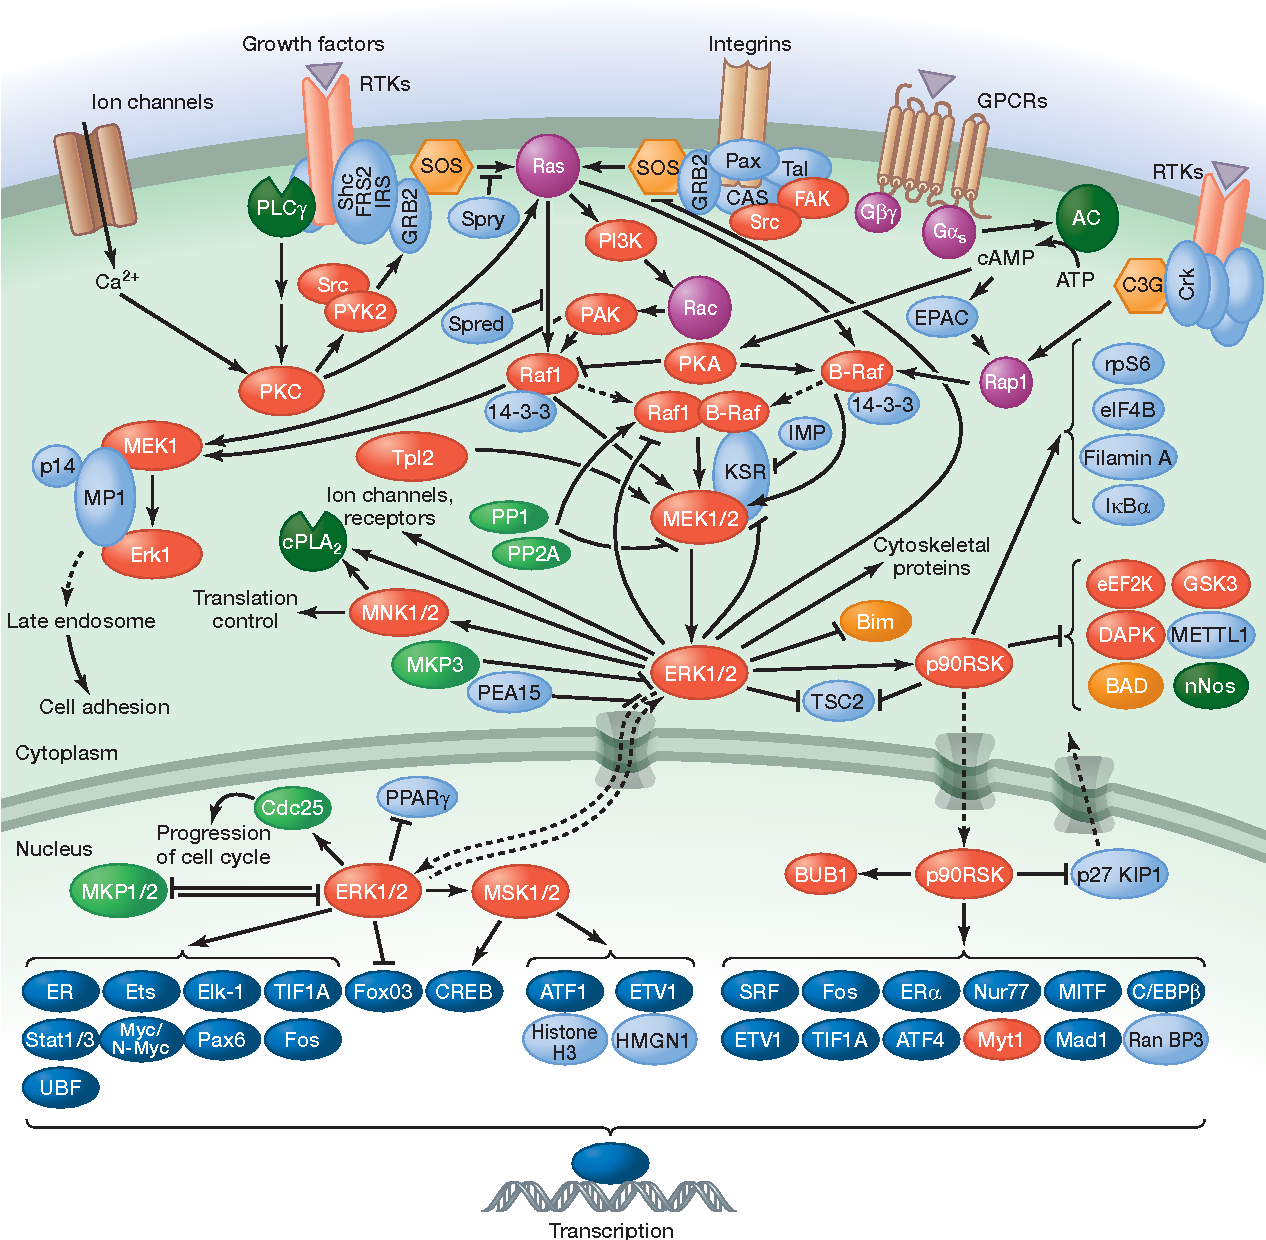 Figure 2 from MAP kinase pathways. - Semantic Scholar on jak-stat signaling pathway, mapk/erk pathway, cyclic adenosine monophosphate, tgf beta signaling pathway, signal transduction, protein kinase, notch signaling pathway, receptor tyrosine kinase, wnt signaling pathway, cyclin-dependent kinase, pi3k/akt/mtor pathway, protein kinase c, adenylate cyclase, c-jun n-terminal kinases,